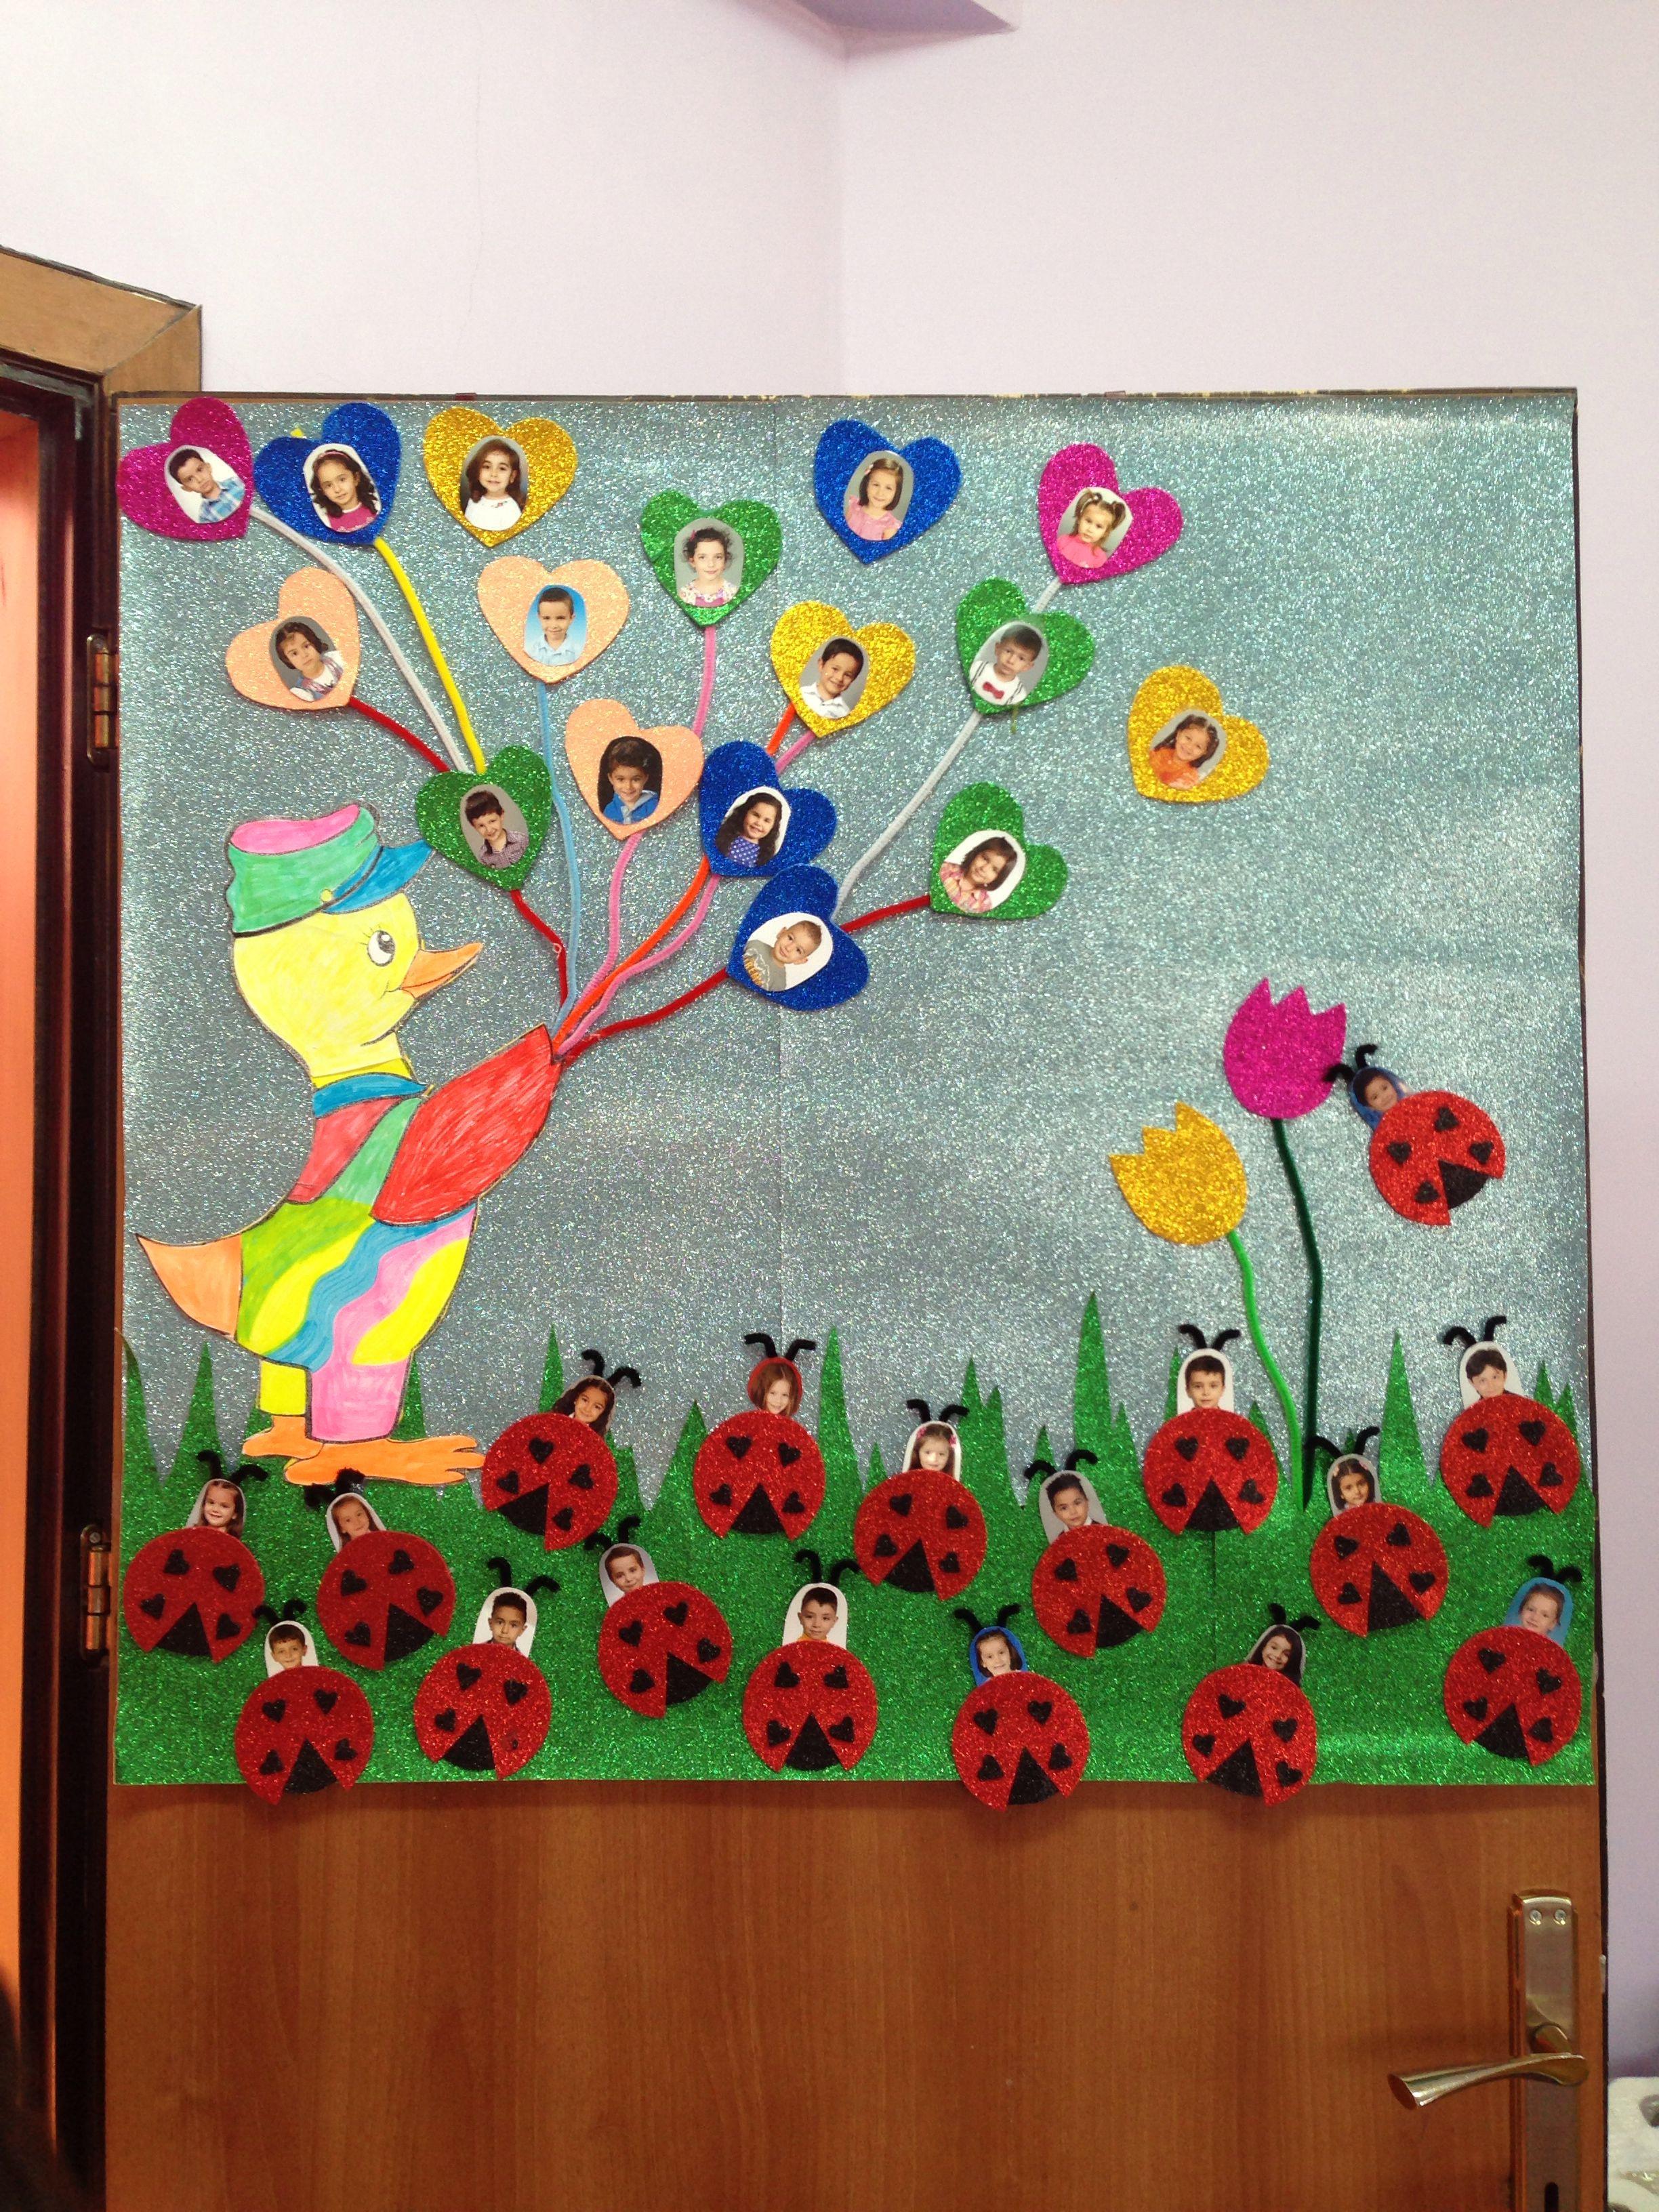 Kapi Susu Mevcut Grafigi Denenecek Projeler School Decorations